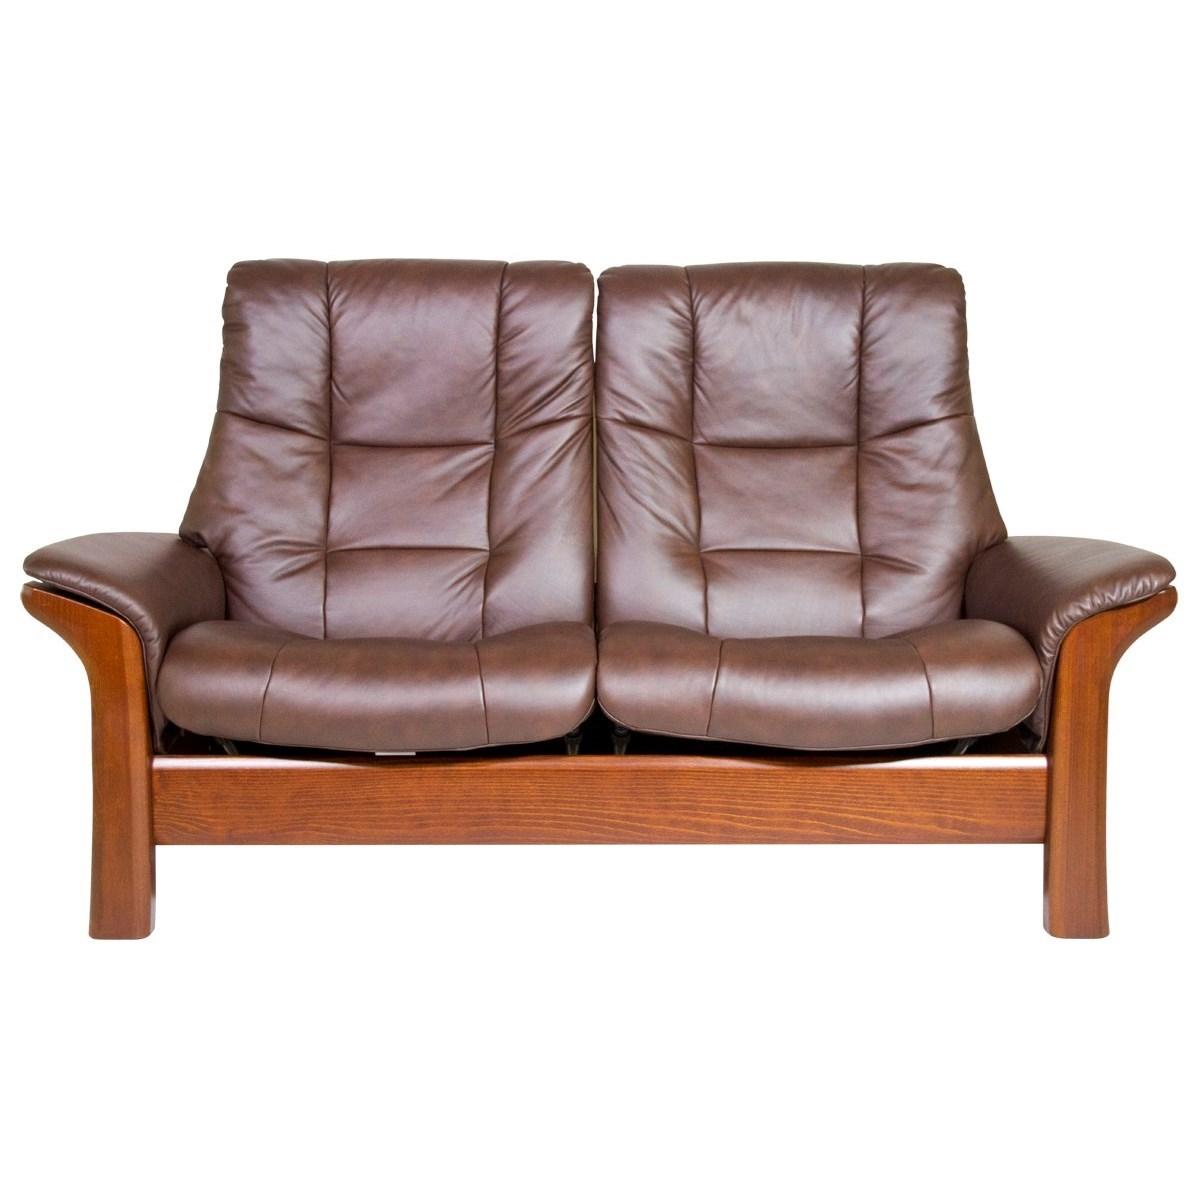 Buckingham Reclining Loveseat by Stressless at HomeWorld Furniture